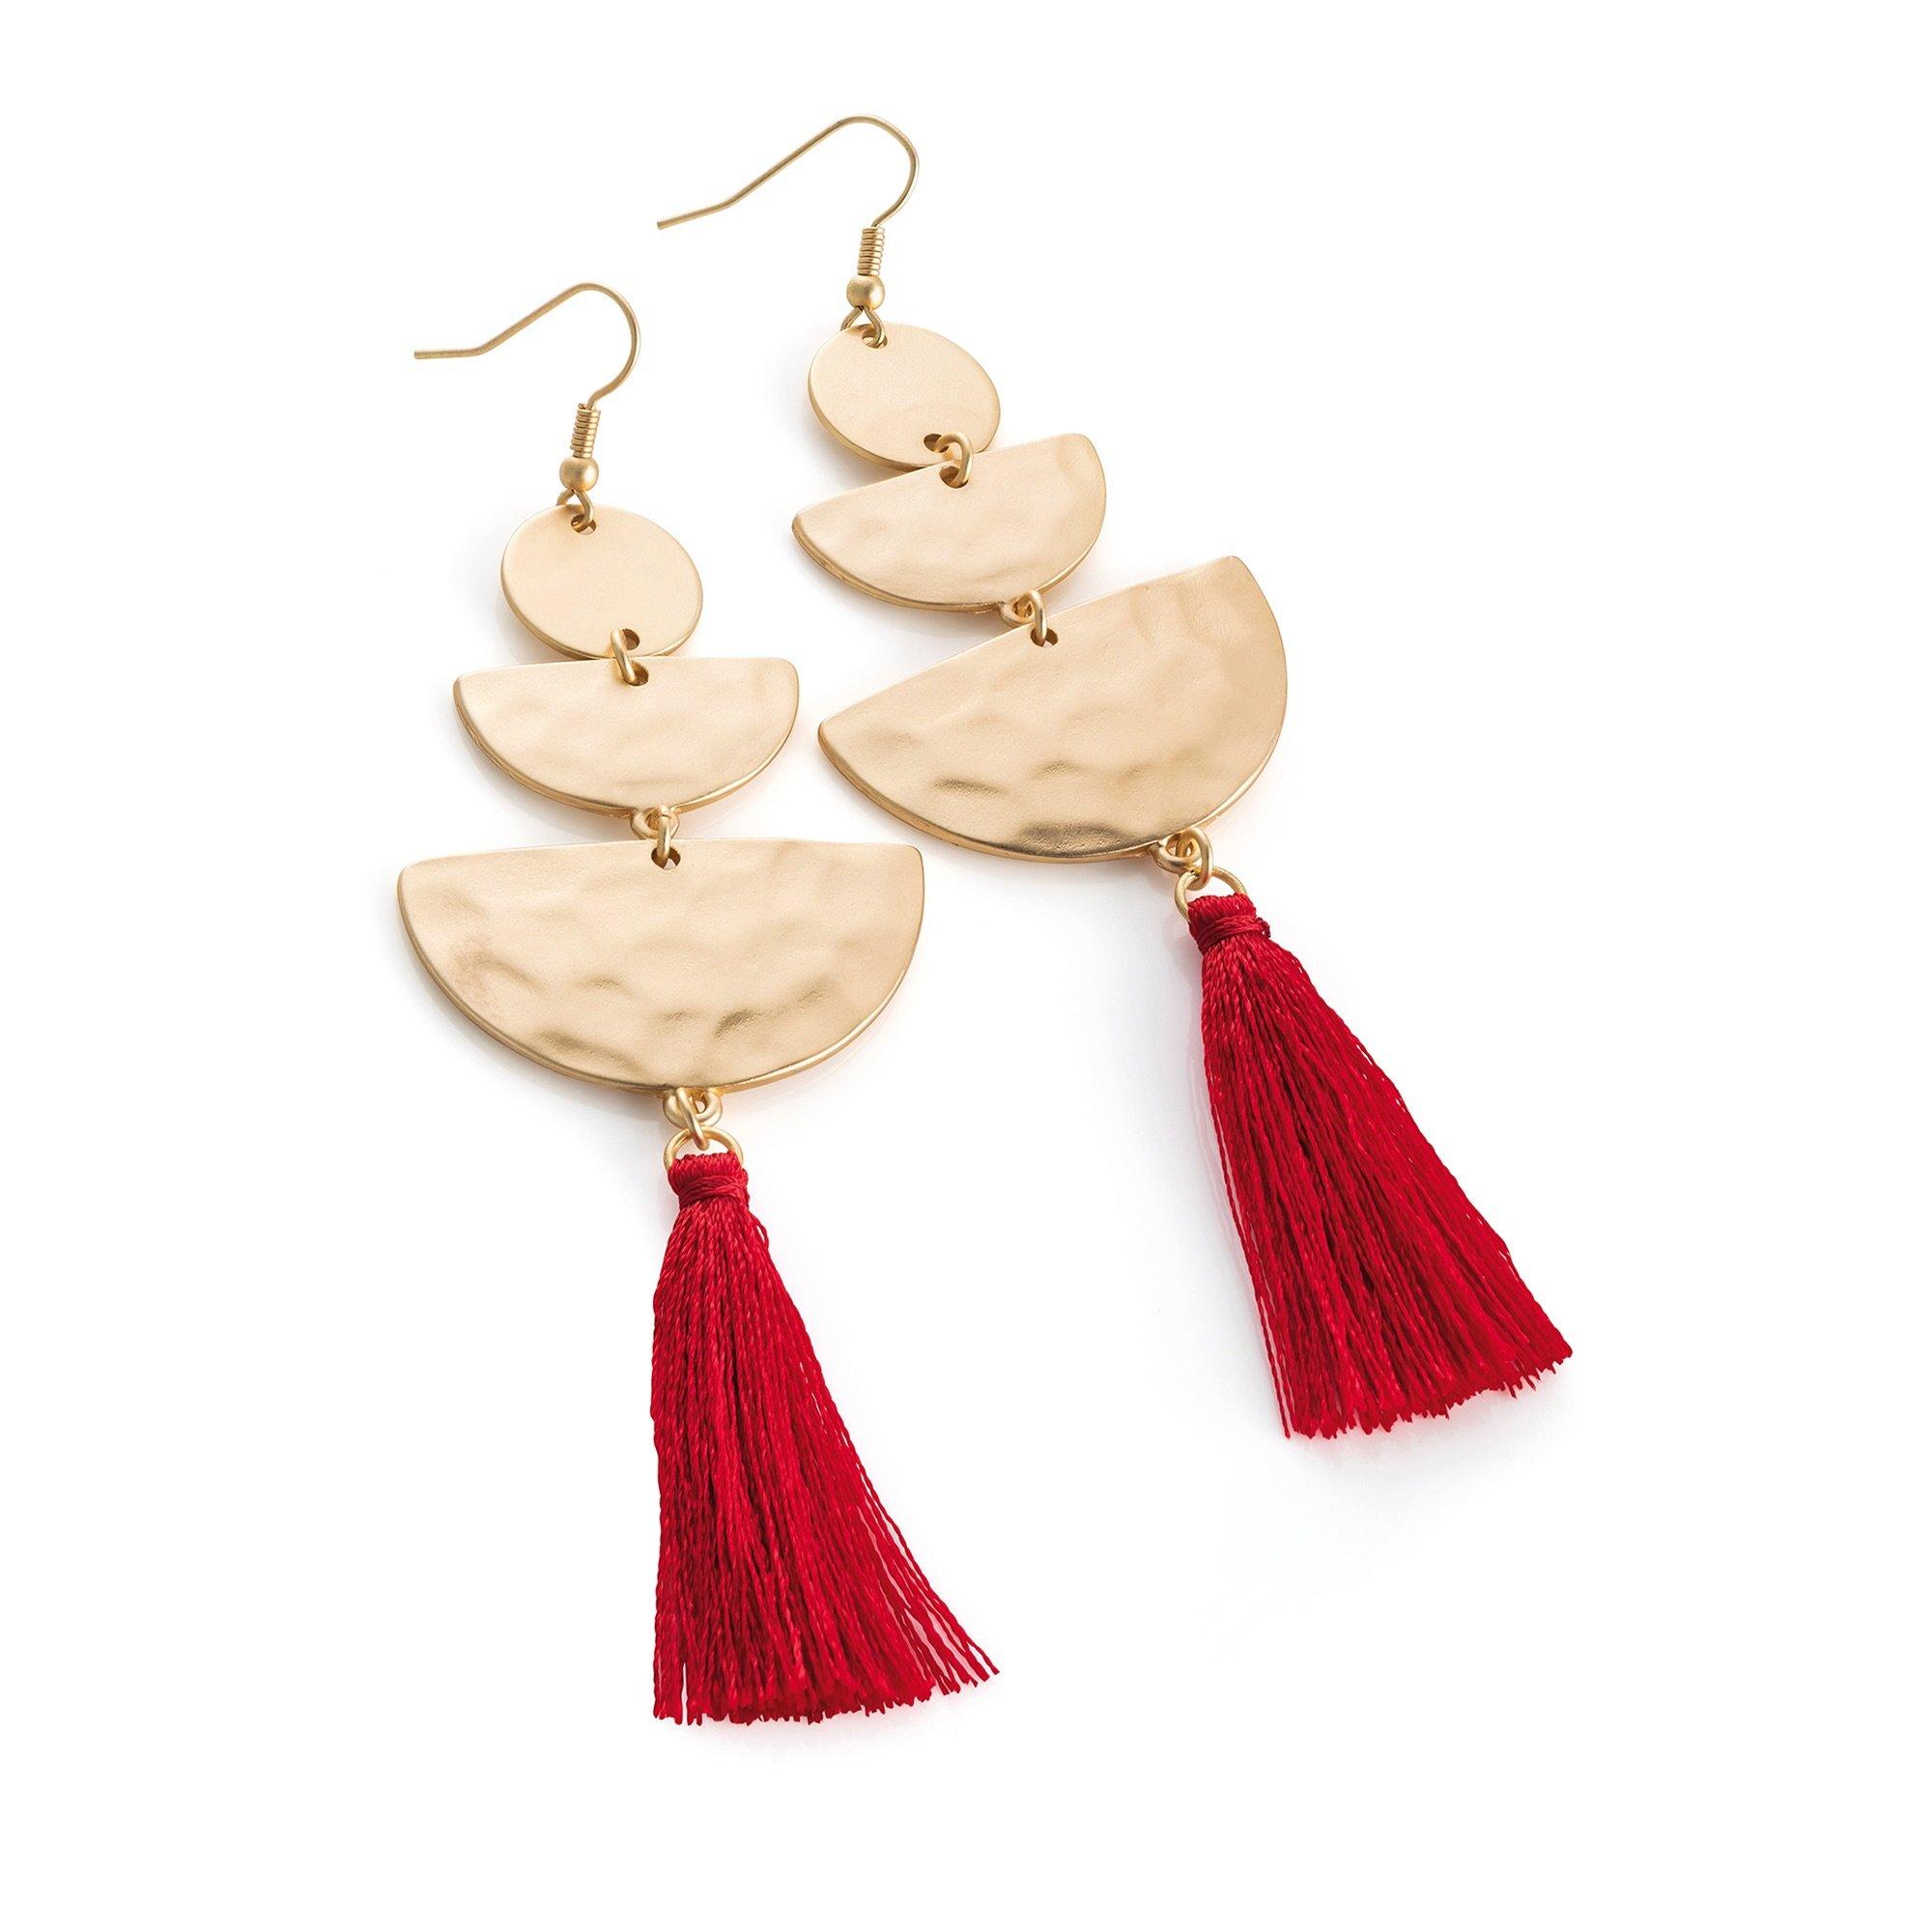 ae0a0ed36f7a8e Matt Gold Red Tassel Earrings - Shimmer And Shine Jewellery